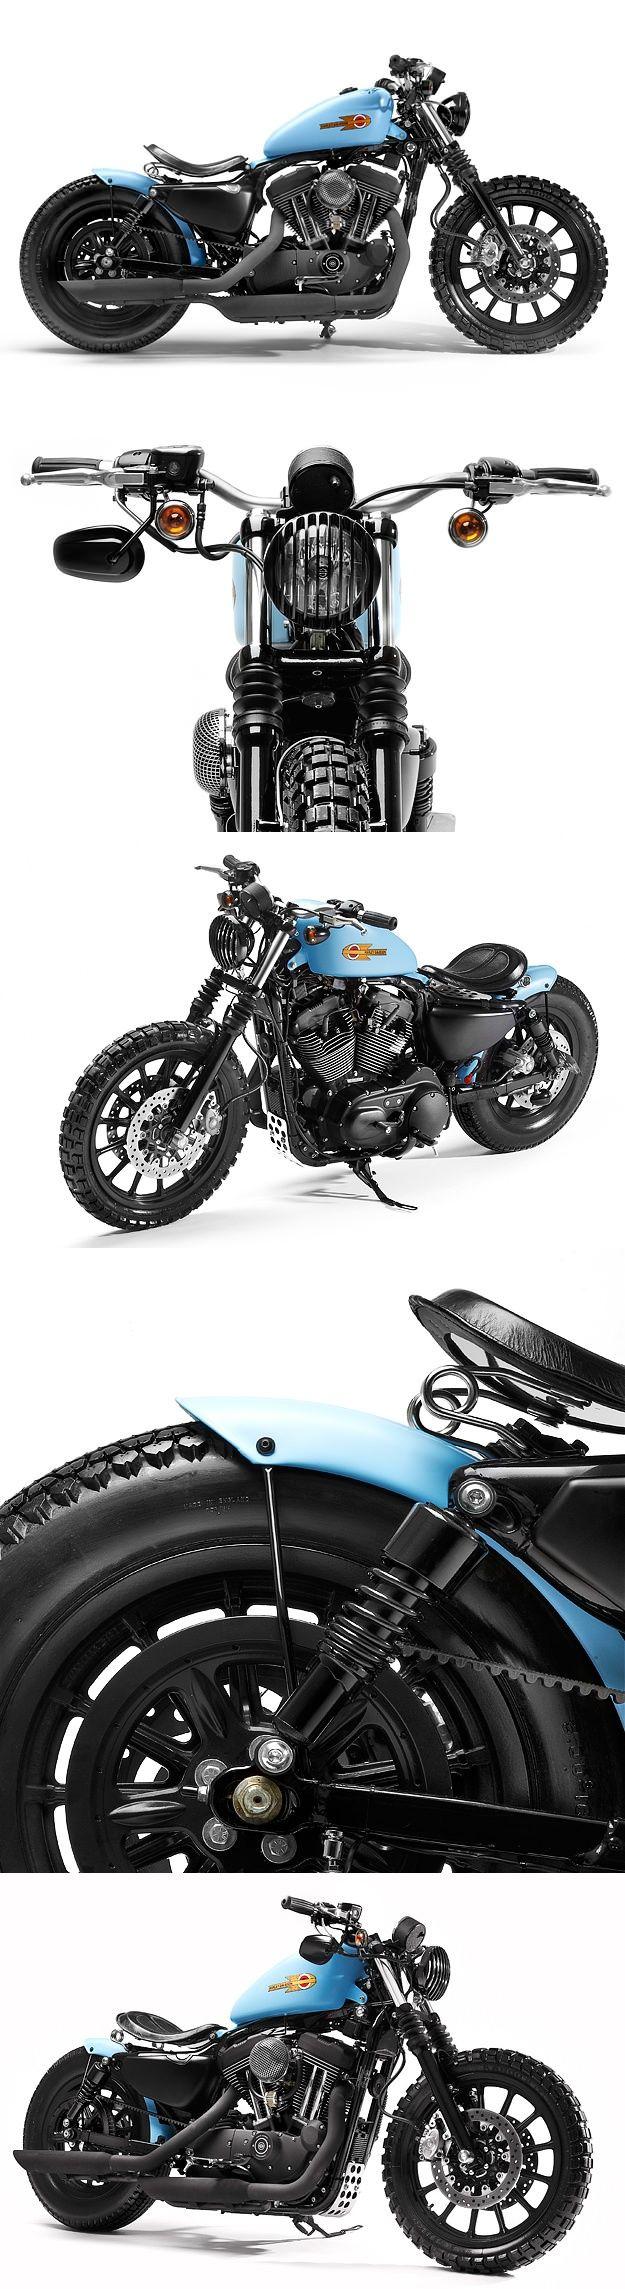 Harley-Davidson Sportster XL1200R 2006 customizada pela equipe da inglesa Shaw Speed Custom. Shaw Speed & Custom Sportster XL1200R http://www.bikeexif.com/harley-1200-sportster